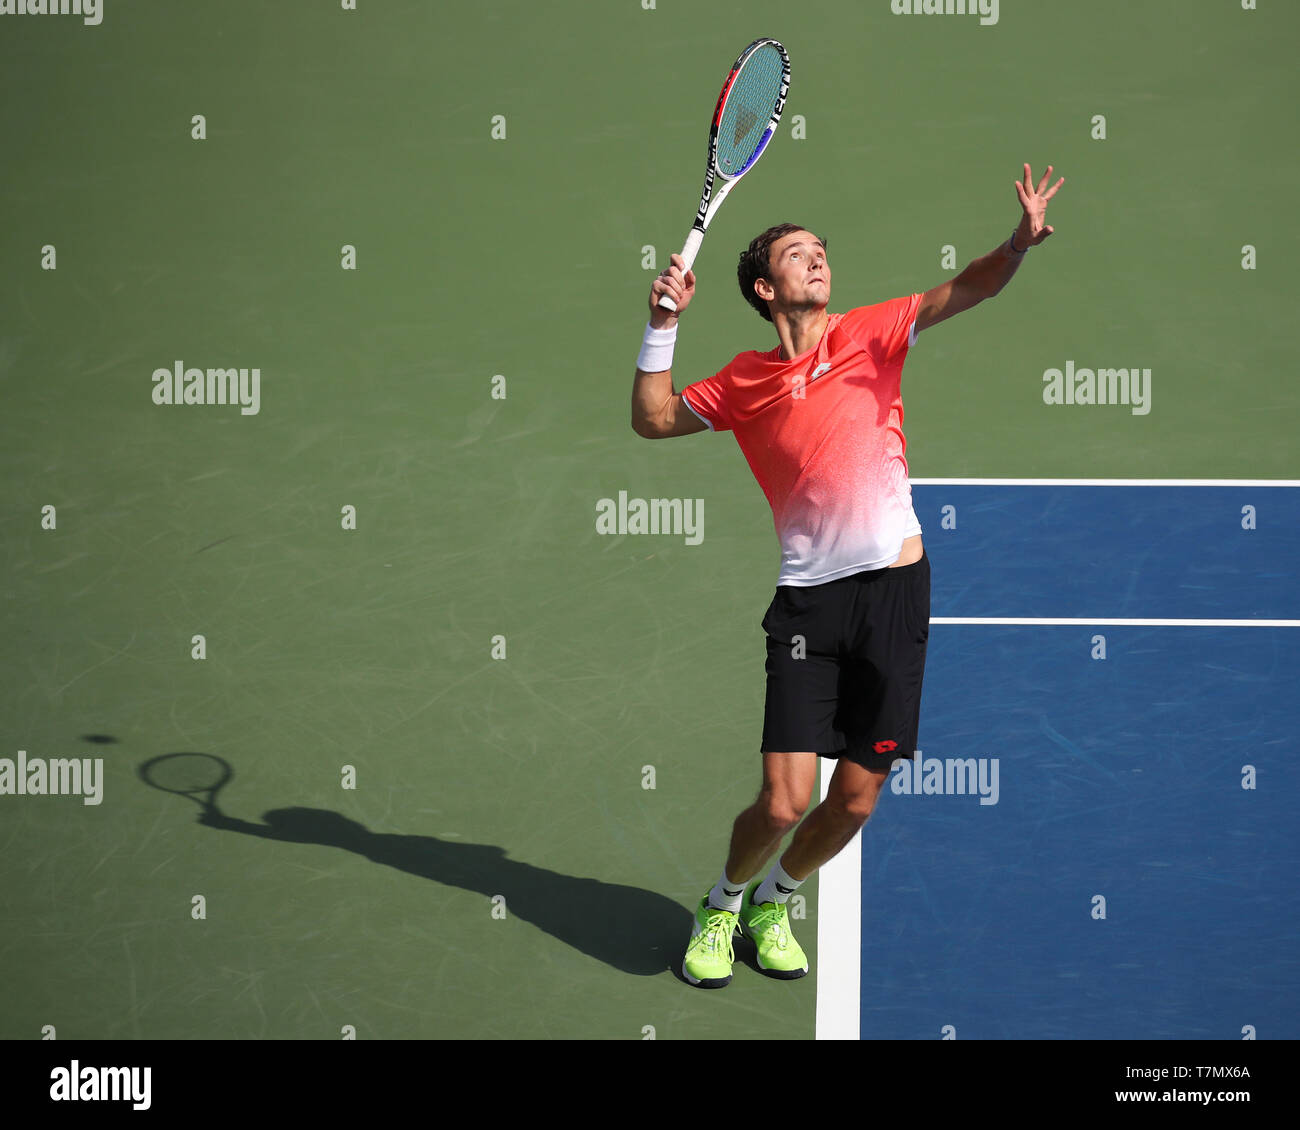 Russian tennis player Daniil Medvedev serving during Dubai Tennis Championships 2019, Dubai, United Arab Emirates - Stock Image